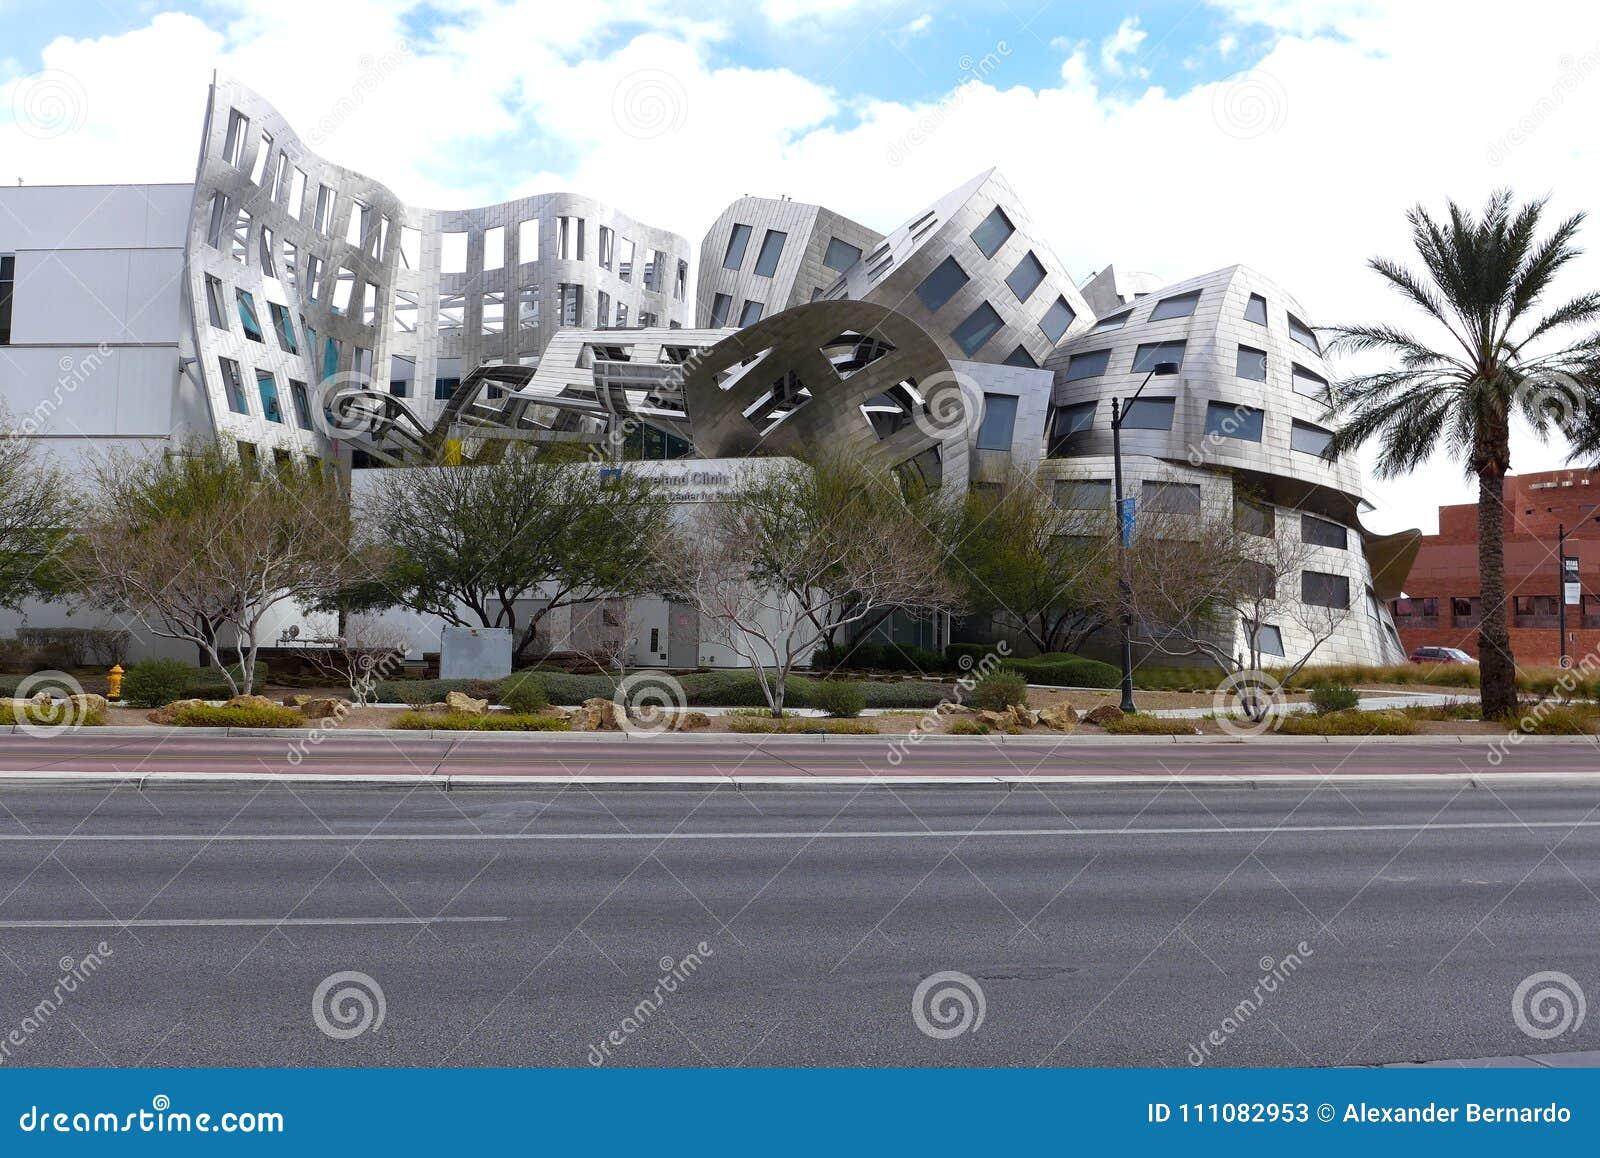 Building in Downtown Las Vegas